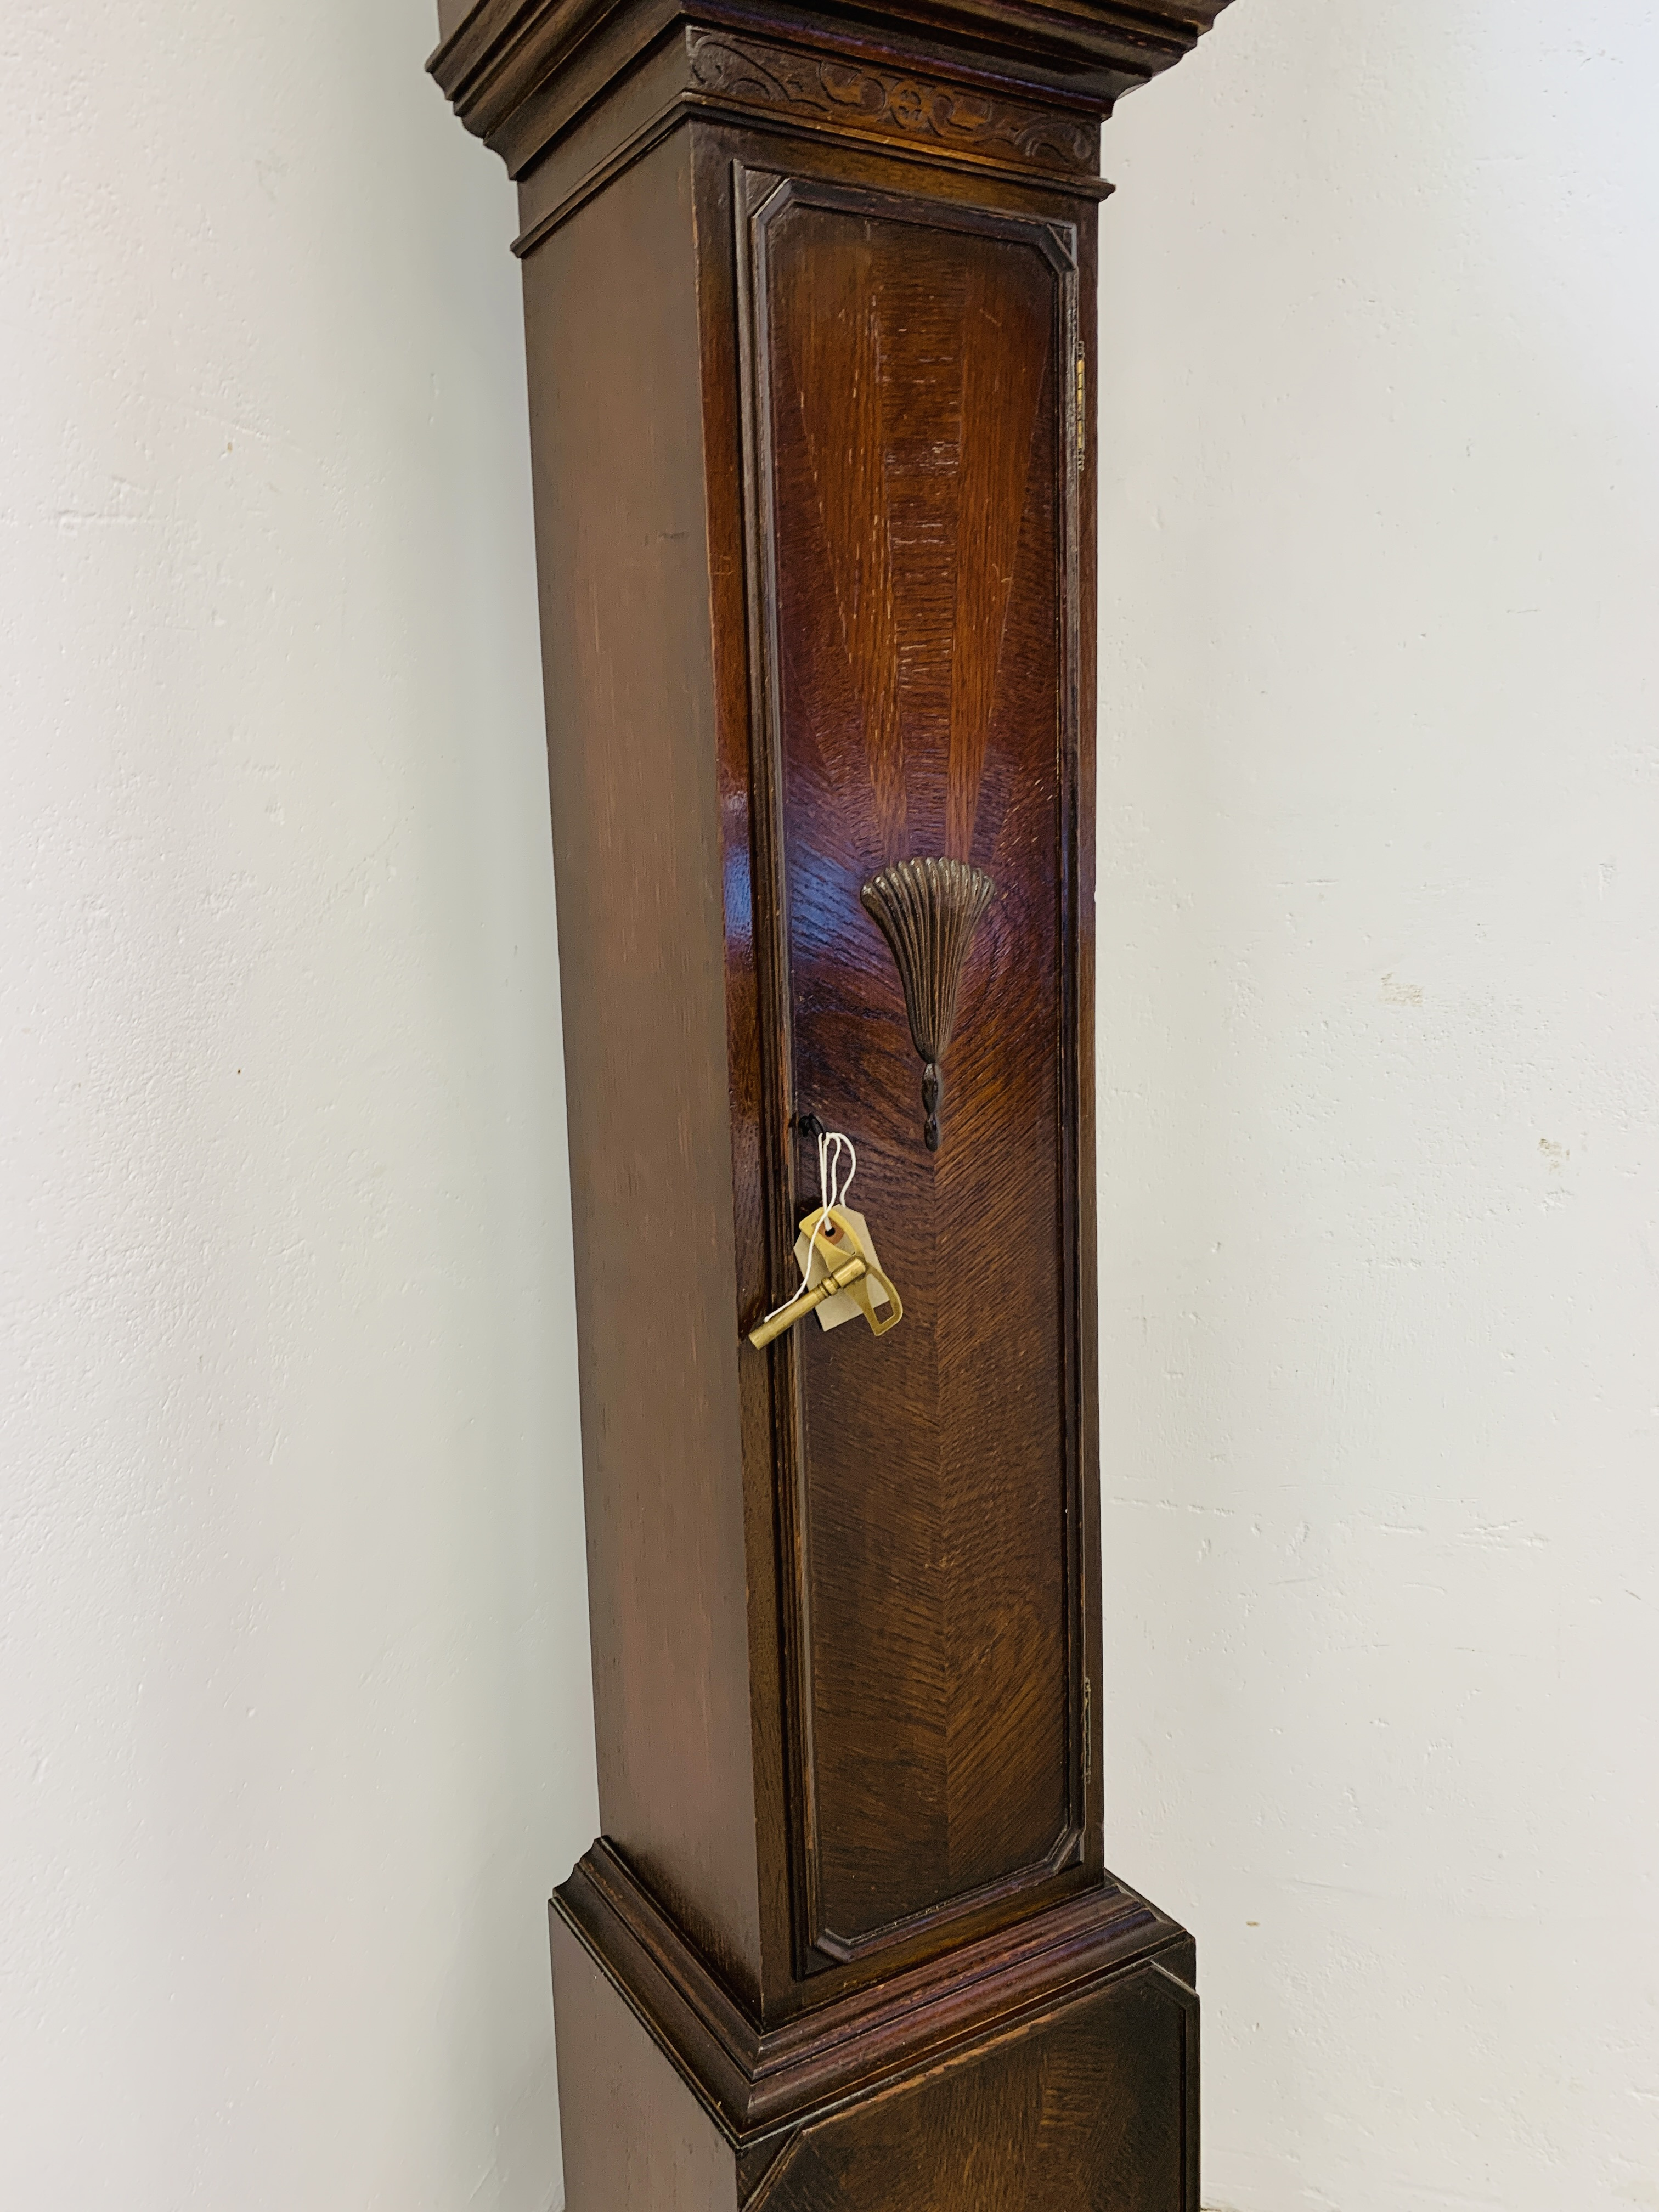 A 1940'S OAK CASED GRANDMOTHER CLOCK, - Image 6 of 12